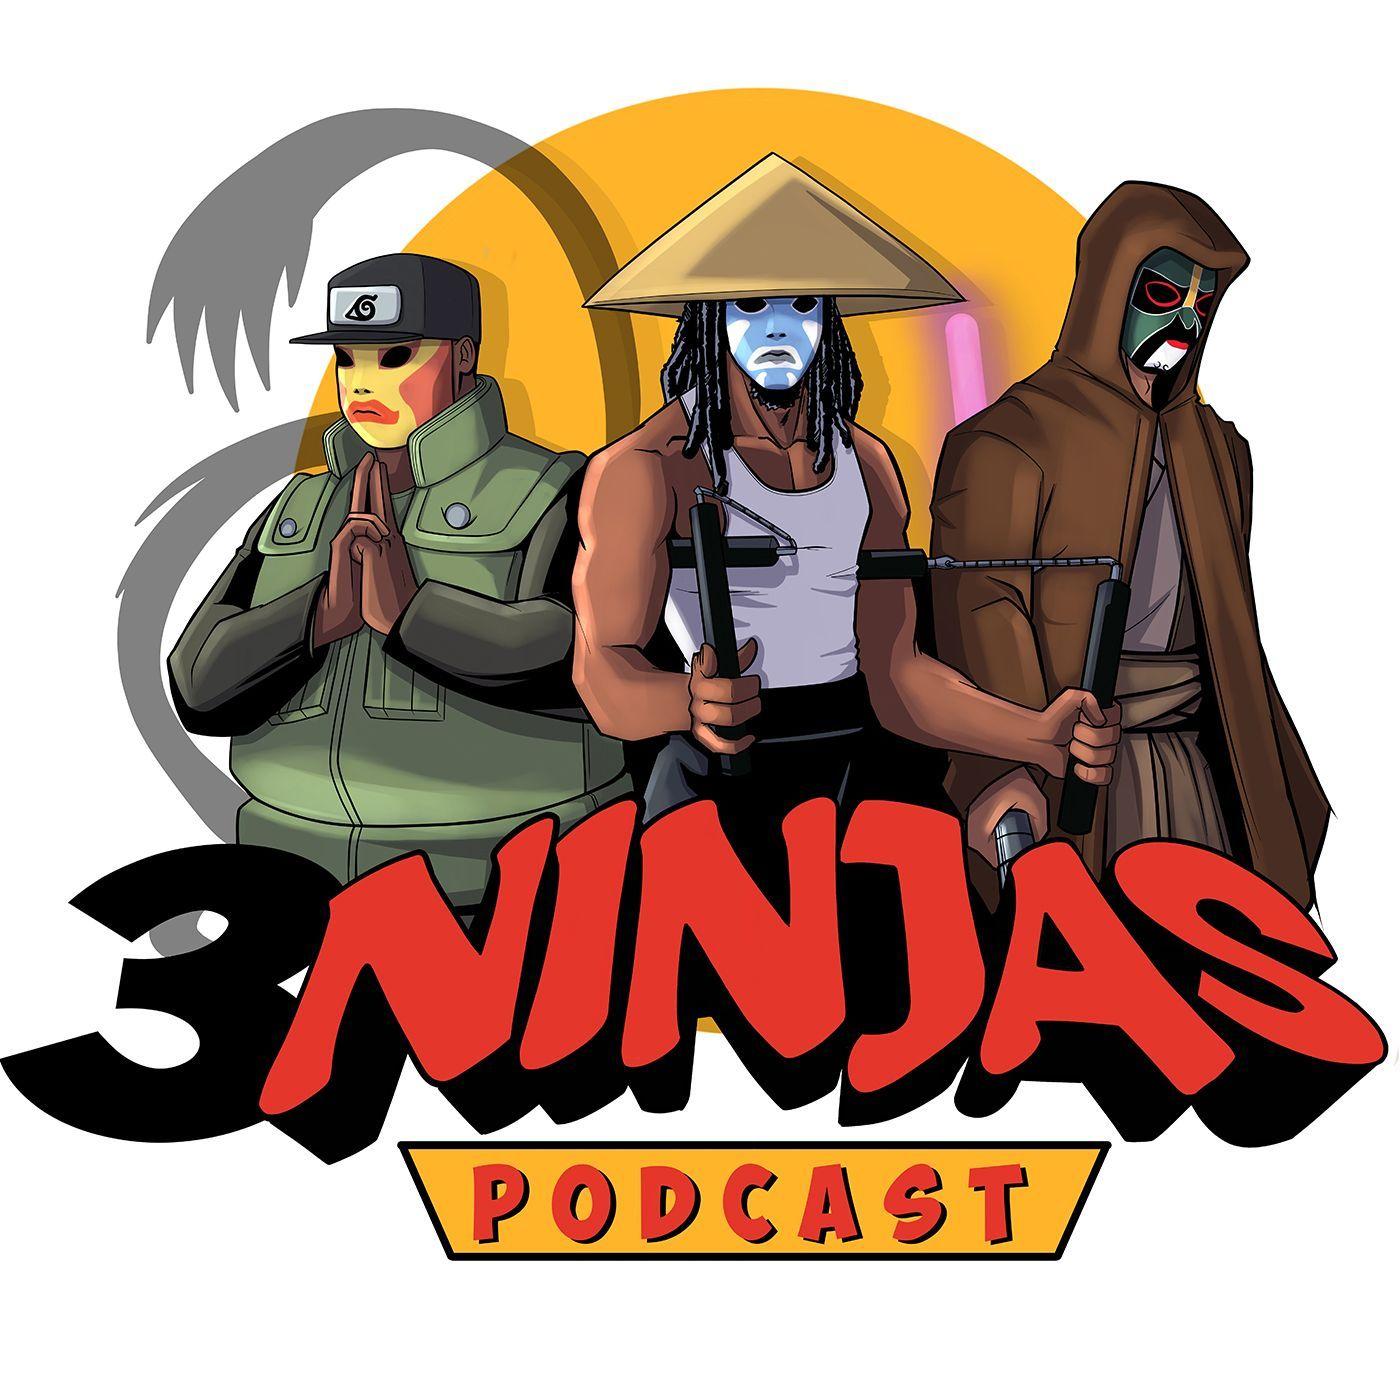 3 Ninjas Podcast